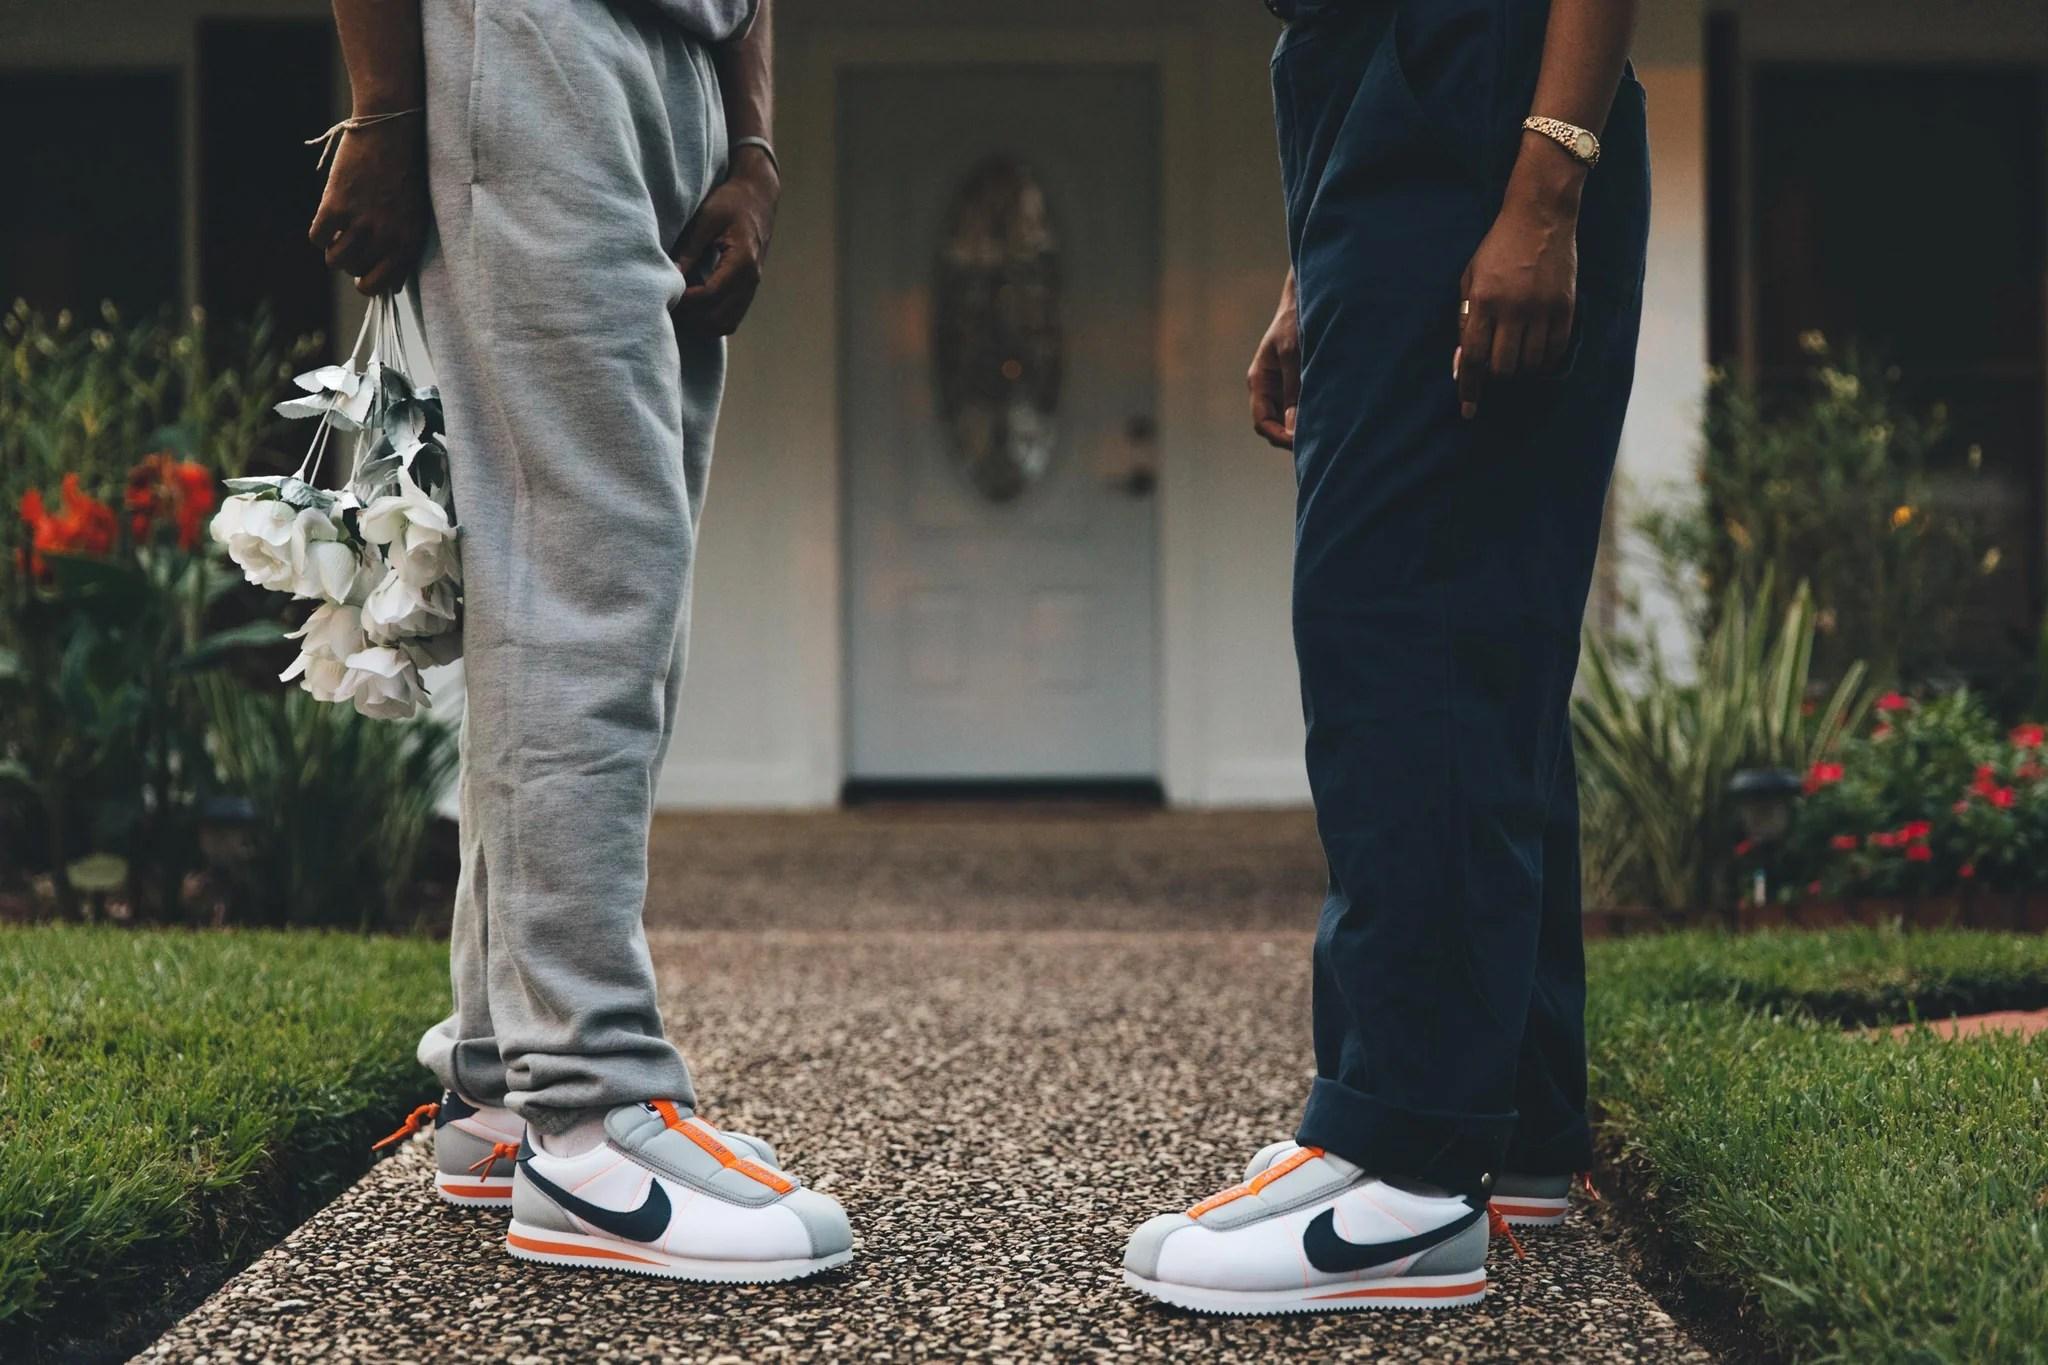 Nike Cortez Kenny IV  Sneaker Politics